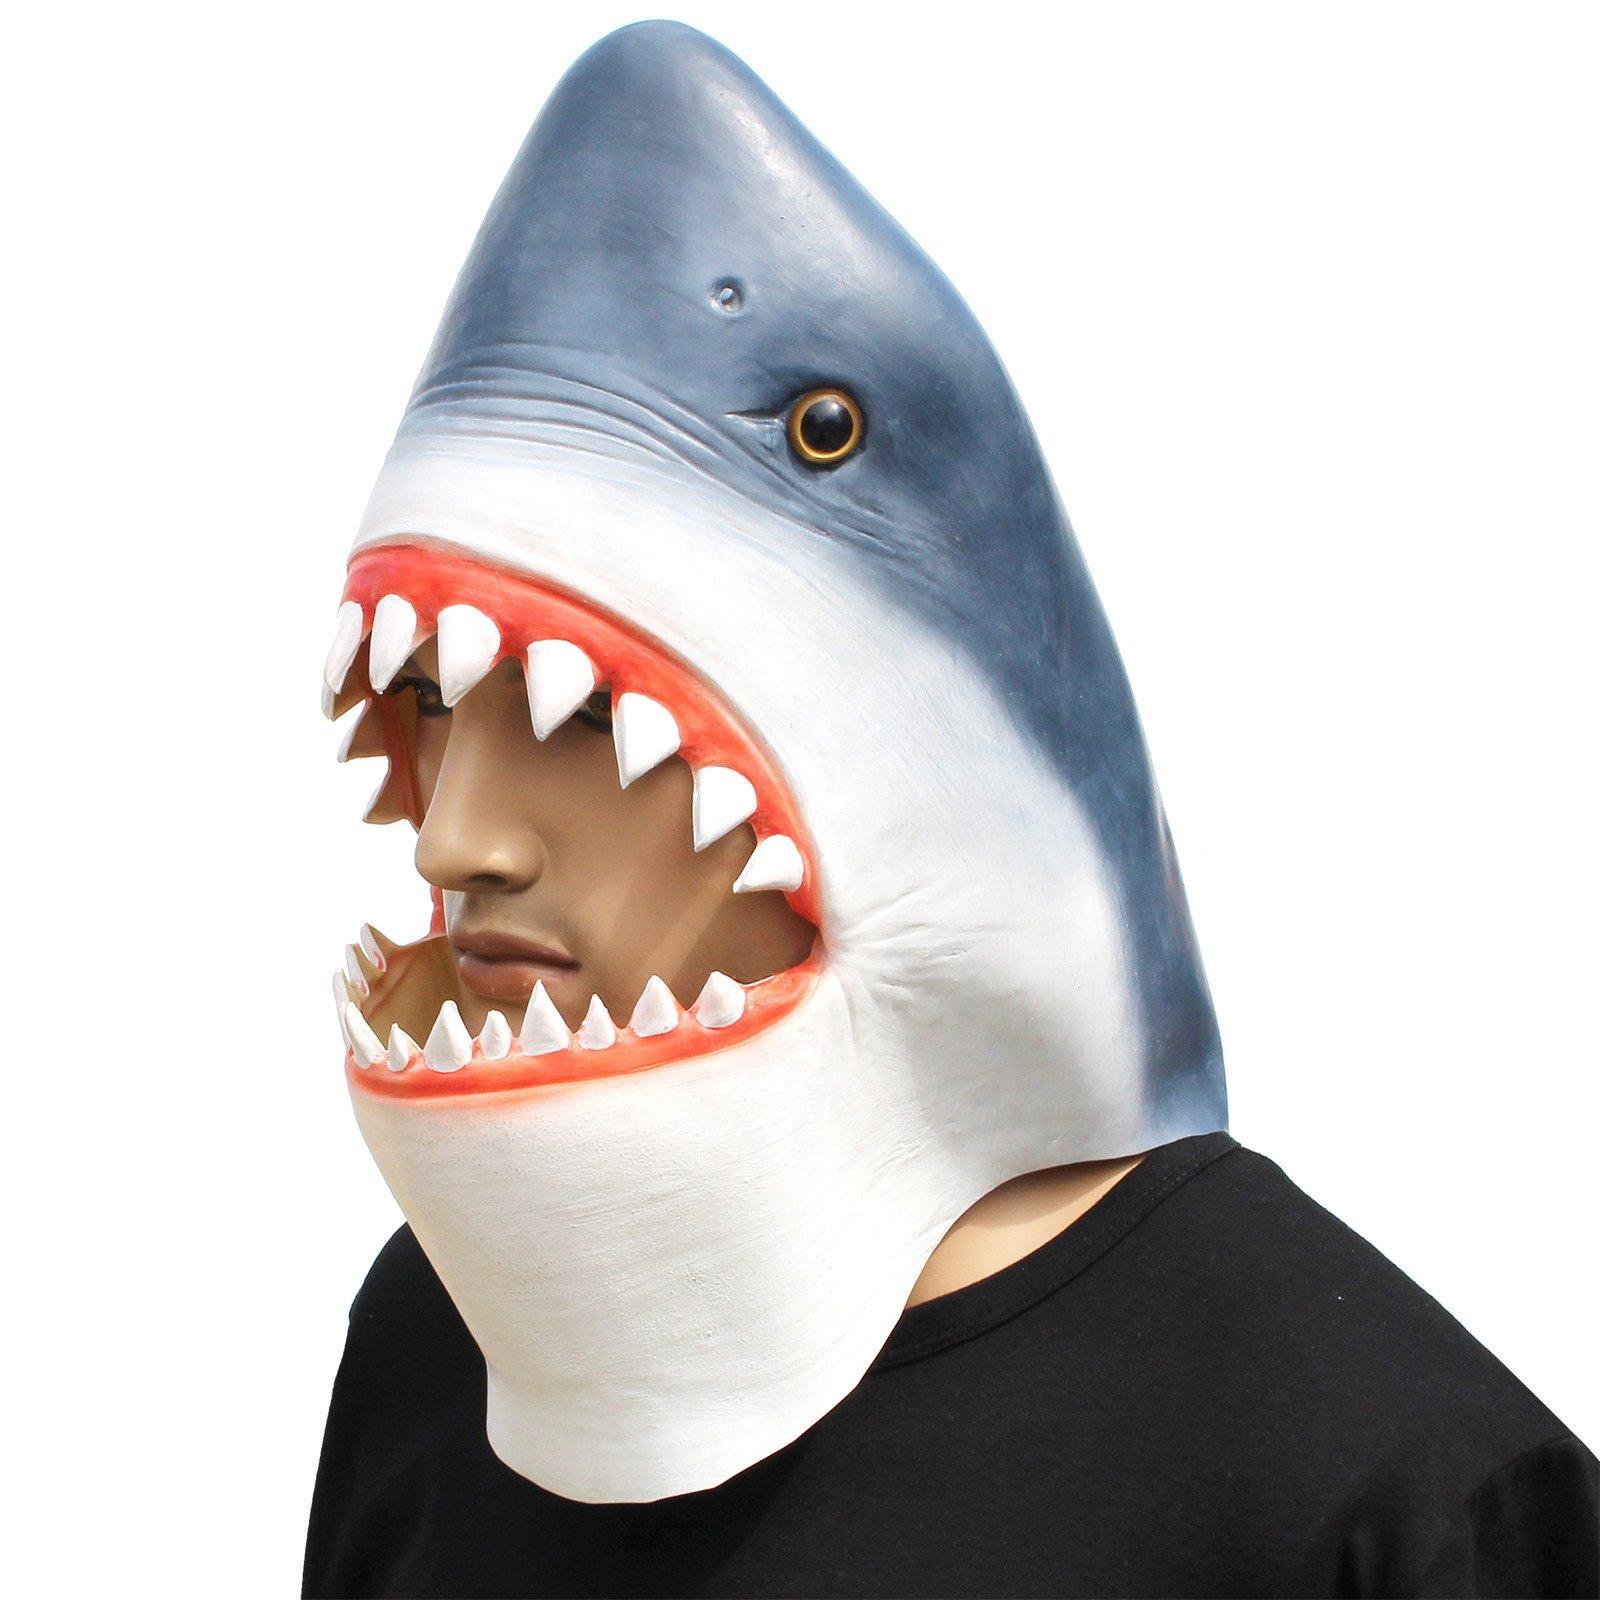 CreepyParty Novelty Halloween Costume Party Latex Animal Head Mask Shark